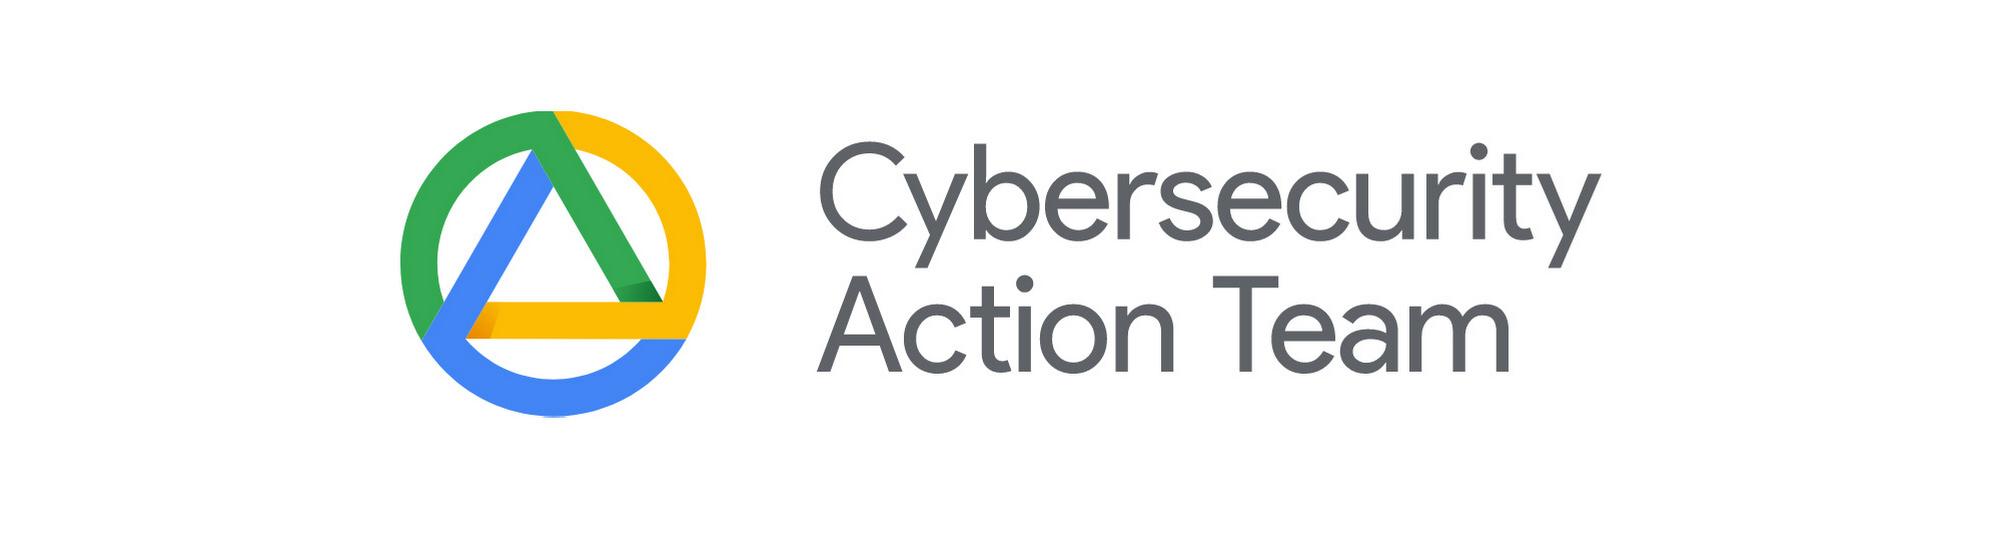 cybersecurity action team.jpg